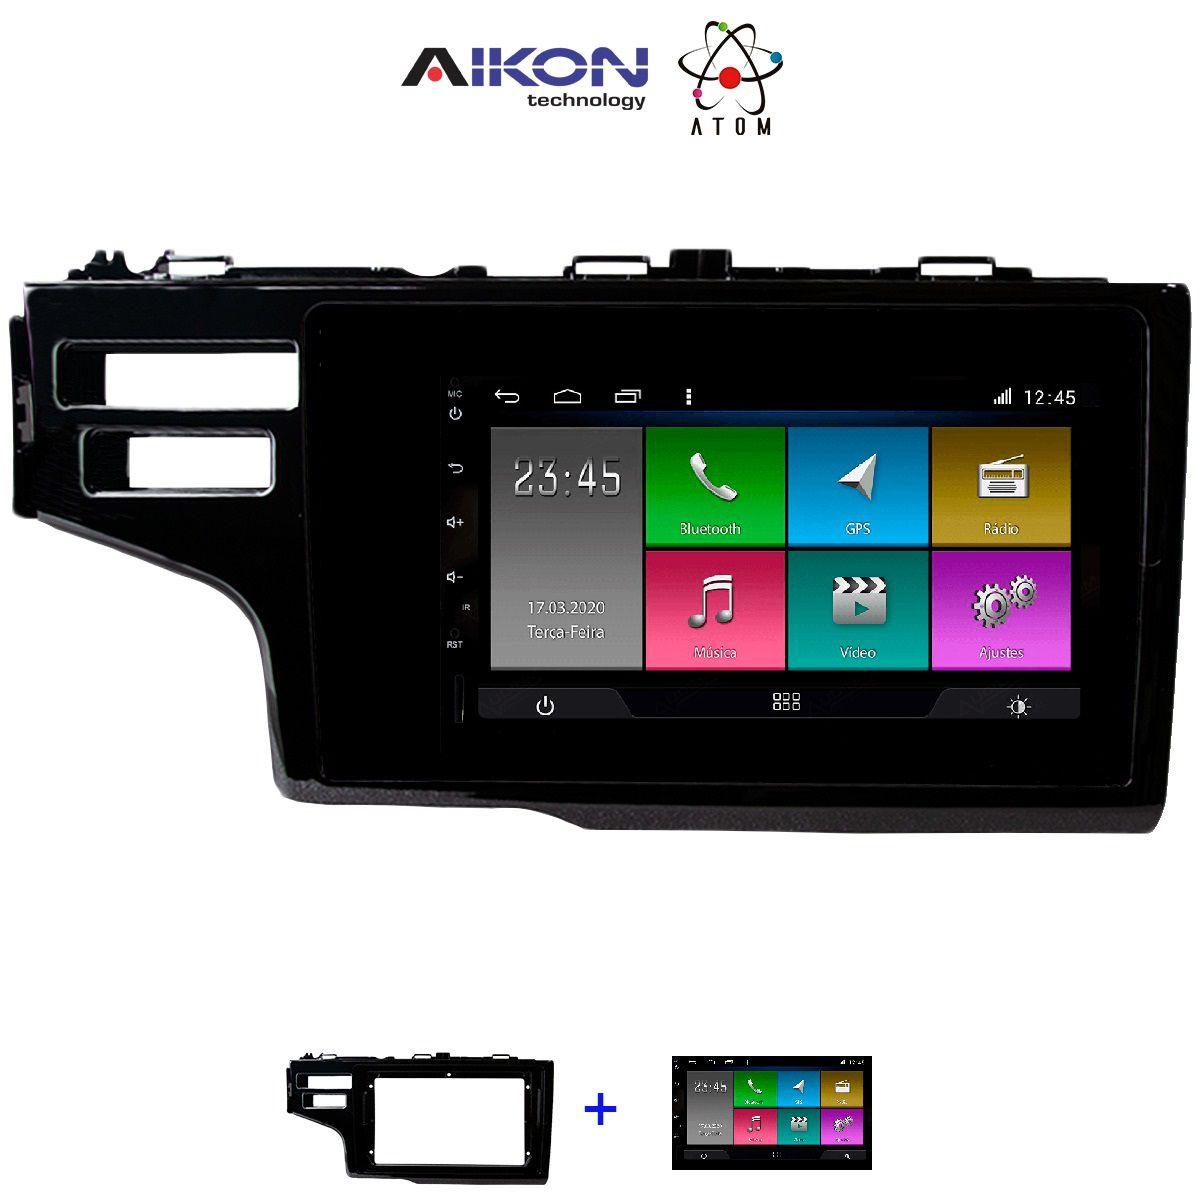 Central Multimidia Honda Fit 2018 a 2020 Tela 7 pol -  Aikon ATOM X7 - Android 8.1 - 2 cameras Camera de ré + Frontal - TV  Digital - GPS Mapa Bluetooth MP3 USB Ipod SD Card